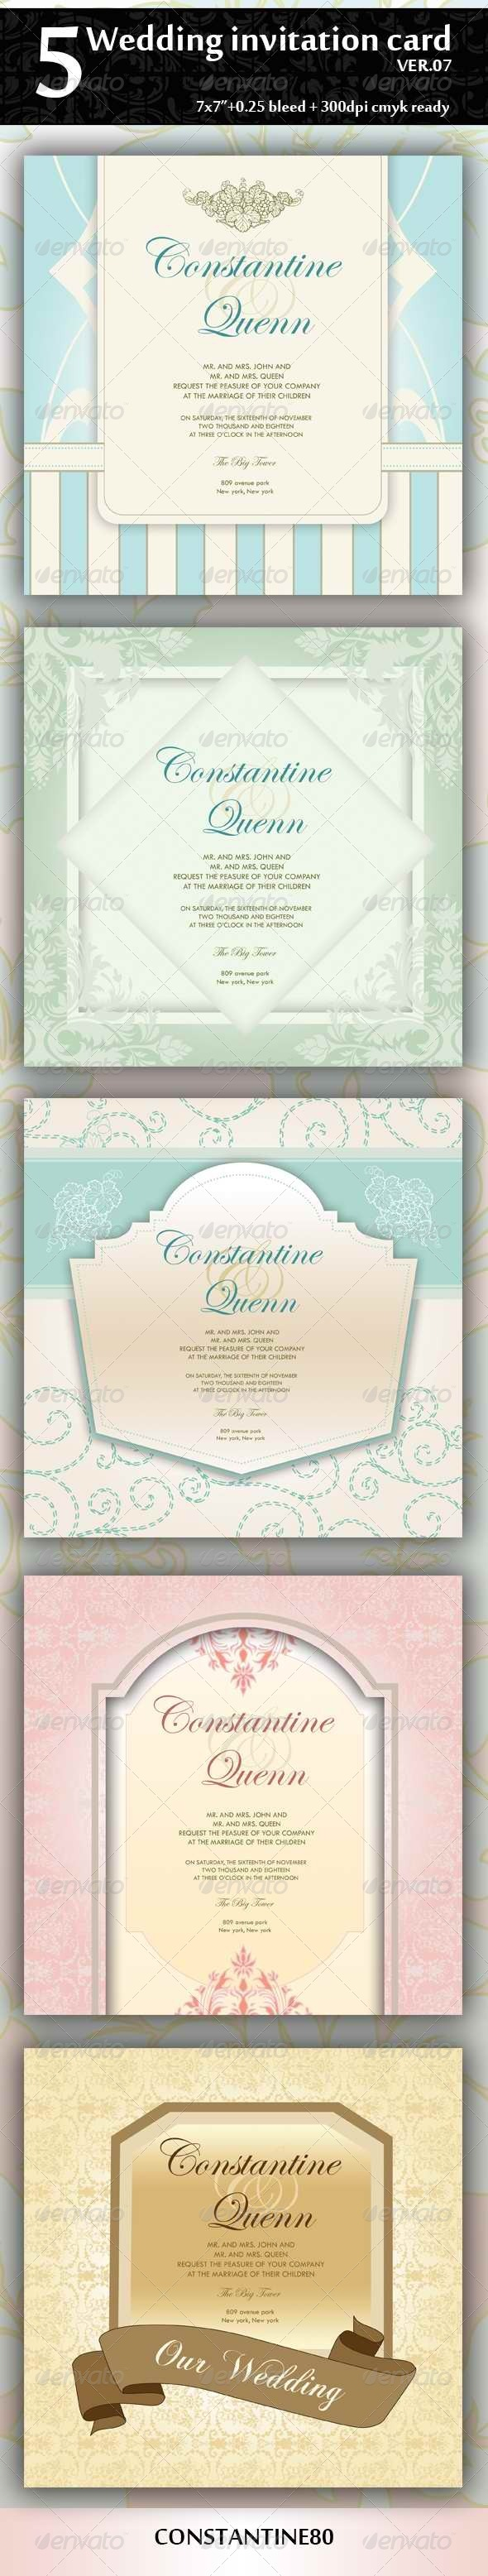 5 Wedding Invitation 7x7 ver07 - Weddings Cards & Invites